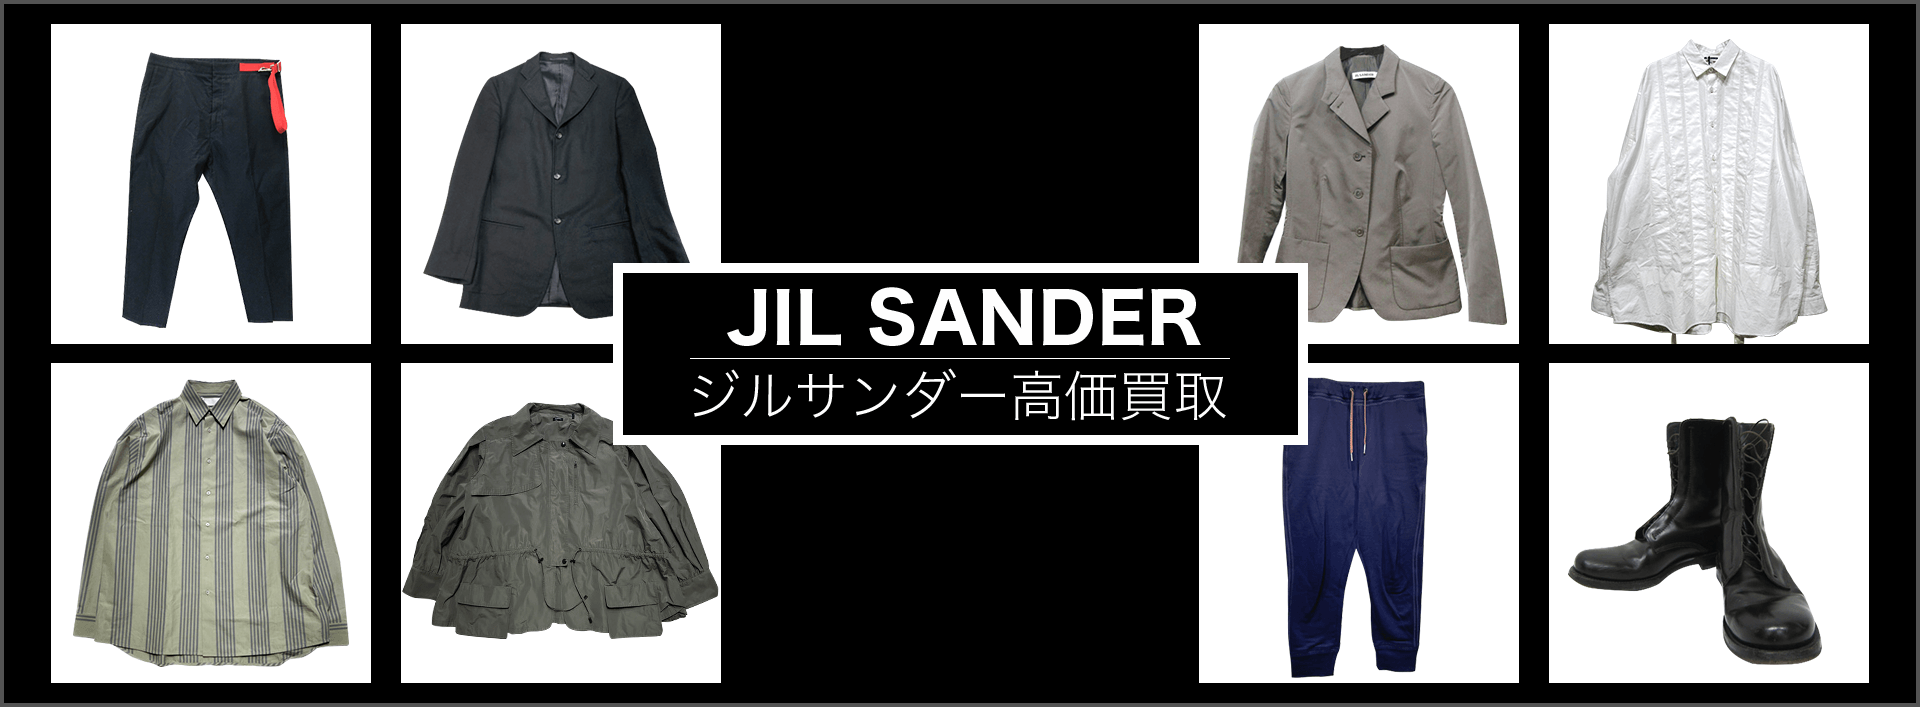 JIL SANDER(ジルサンダー)高価買取